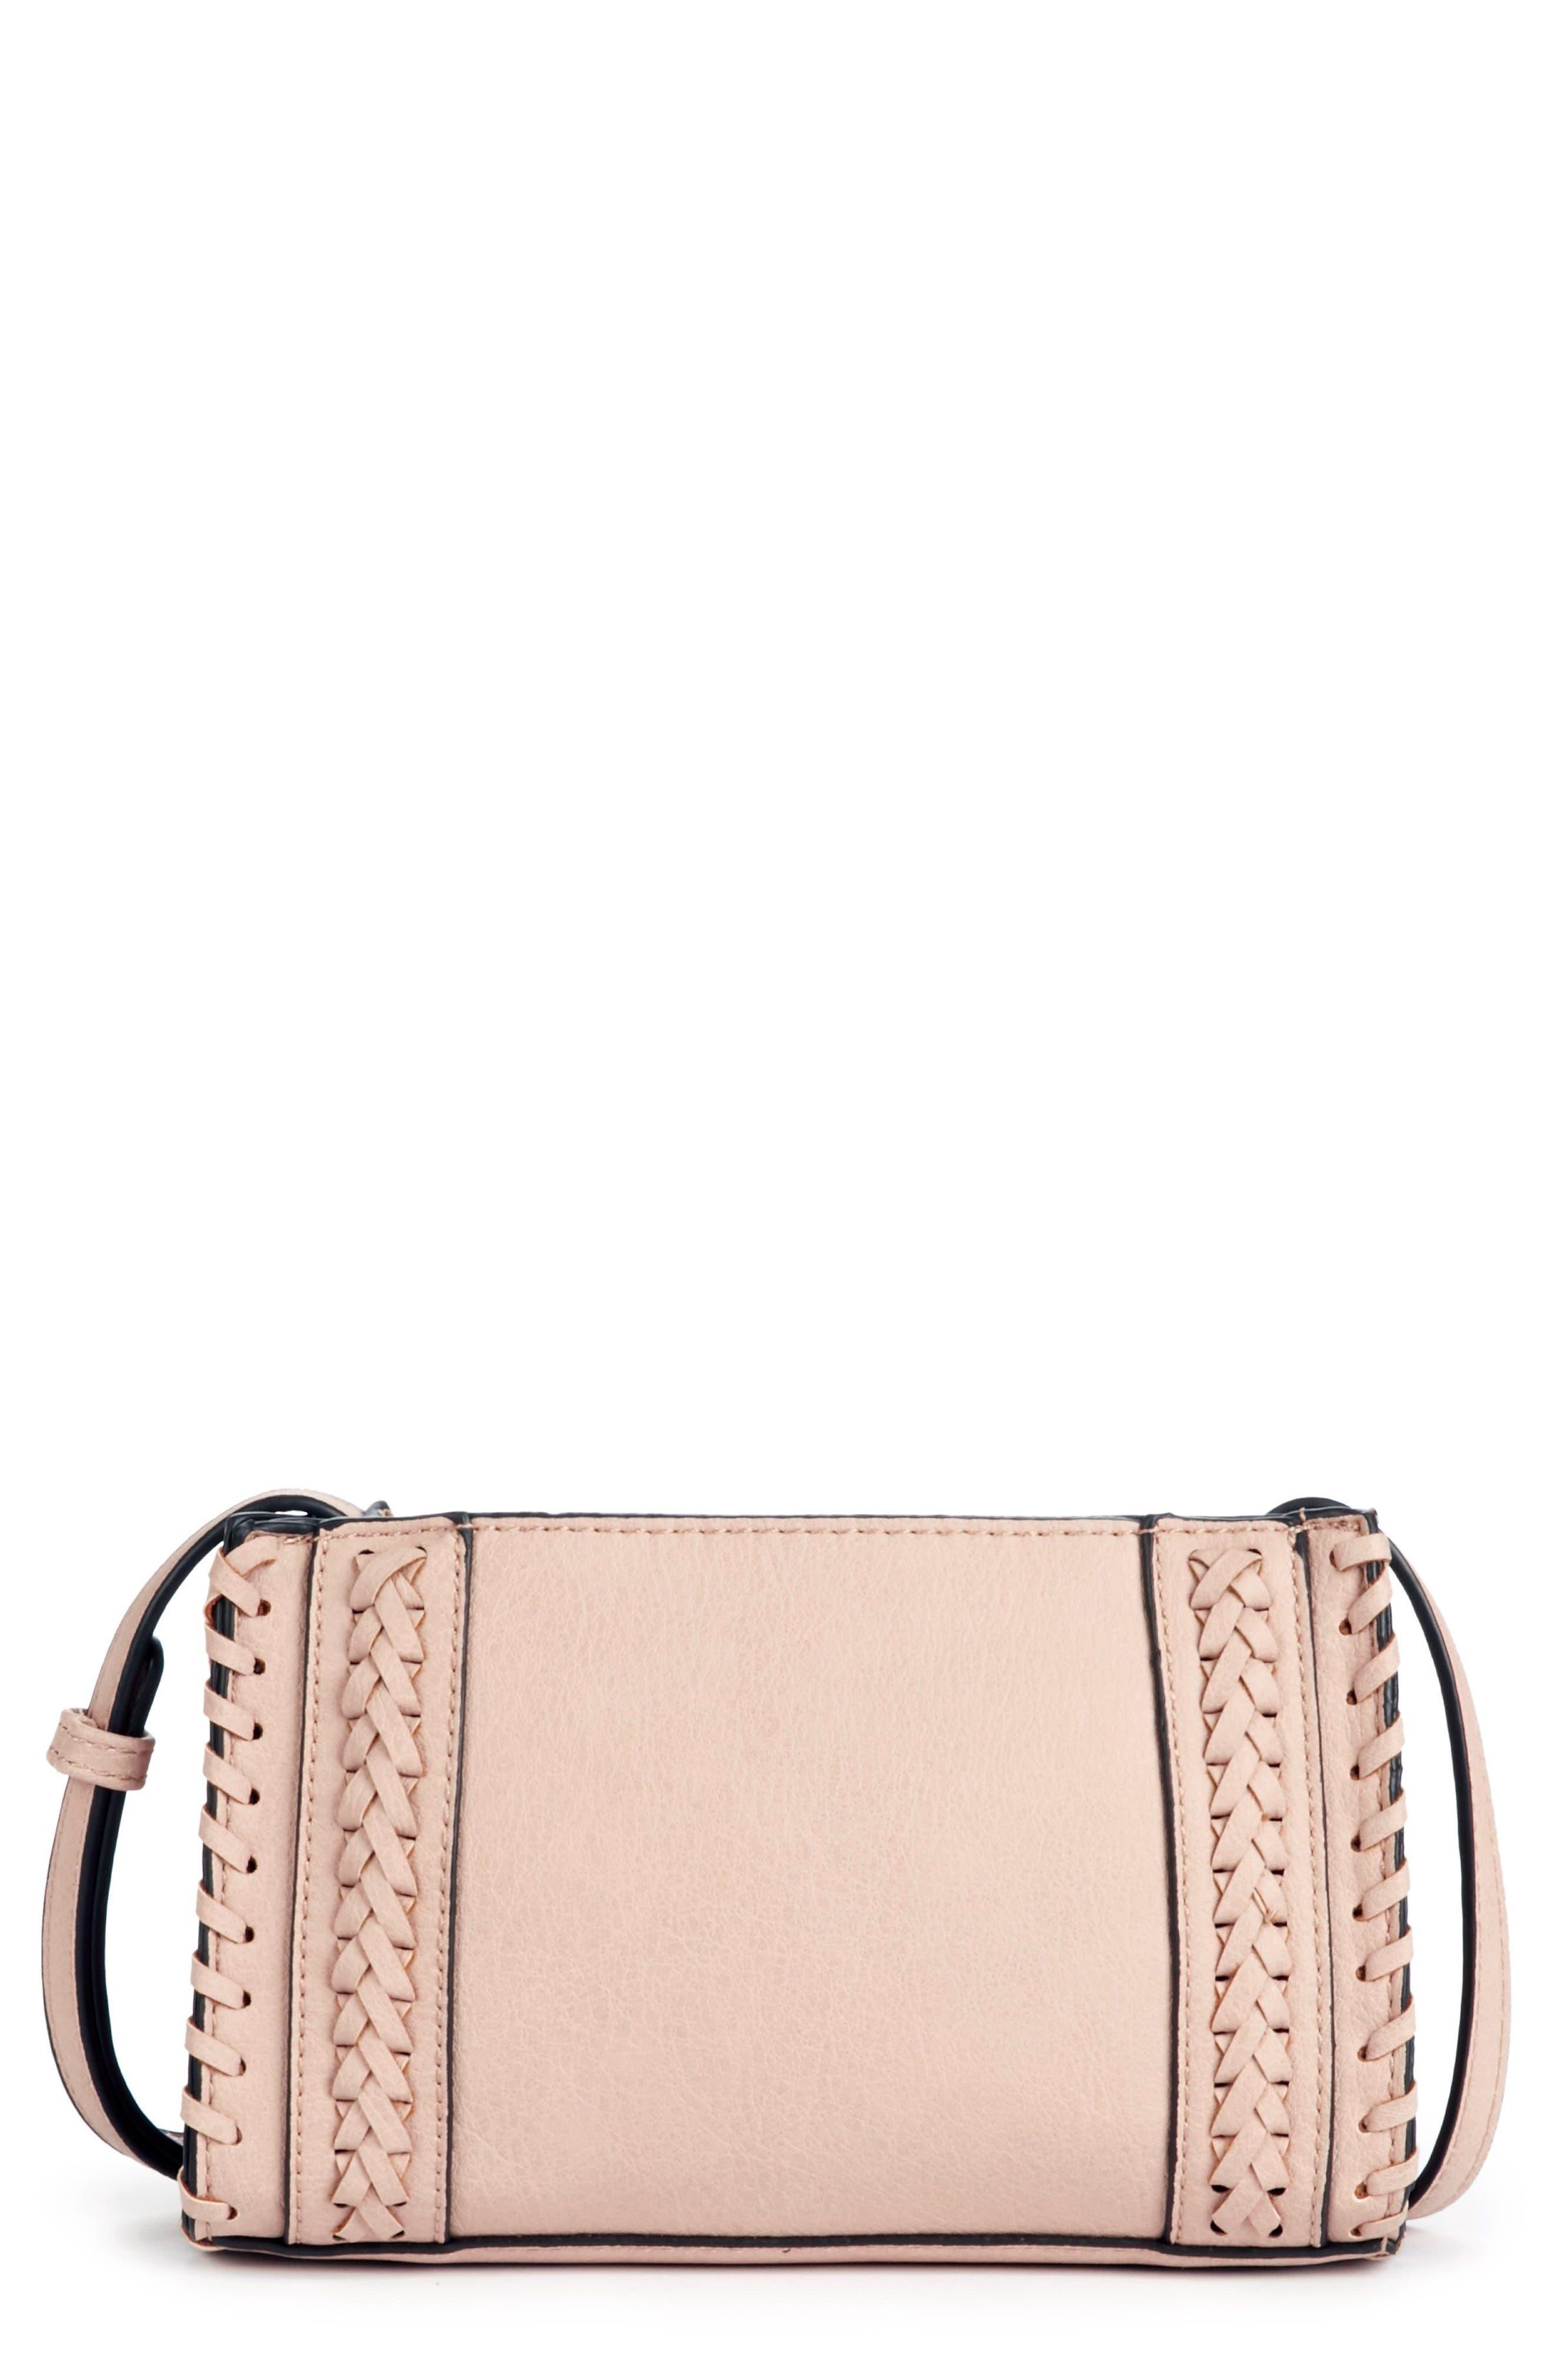 Destin Faux Leather Crossbody Bag,                         Main,                         color, Blush